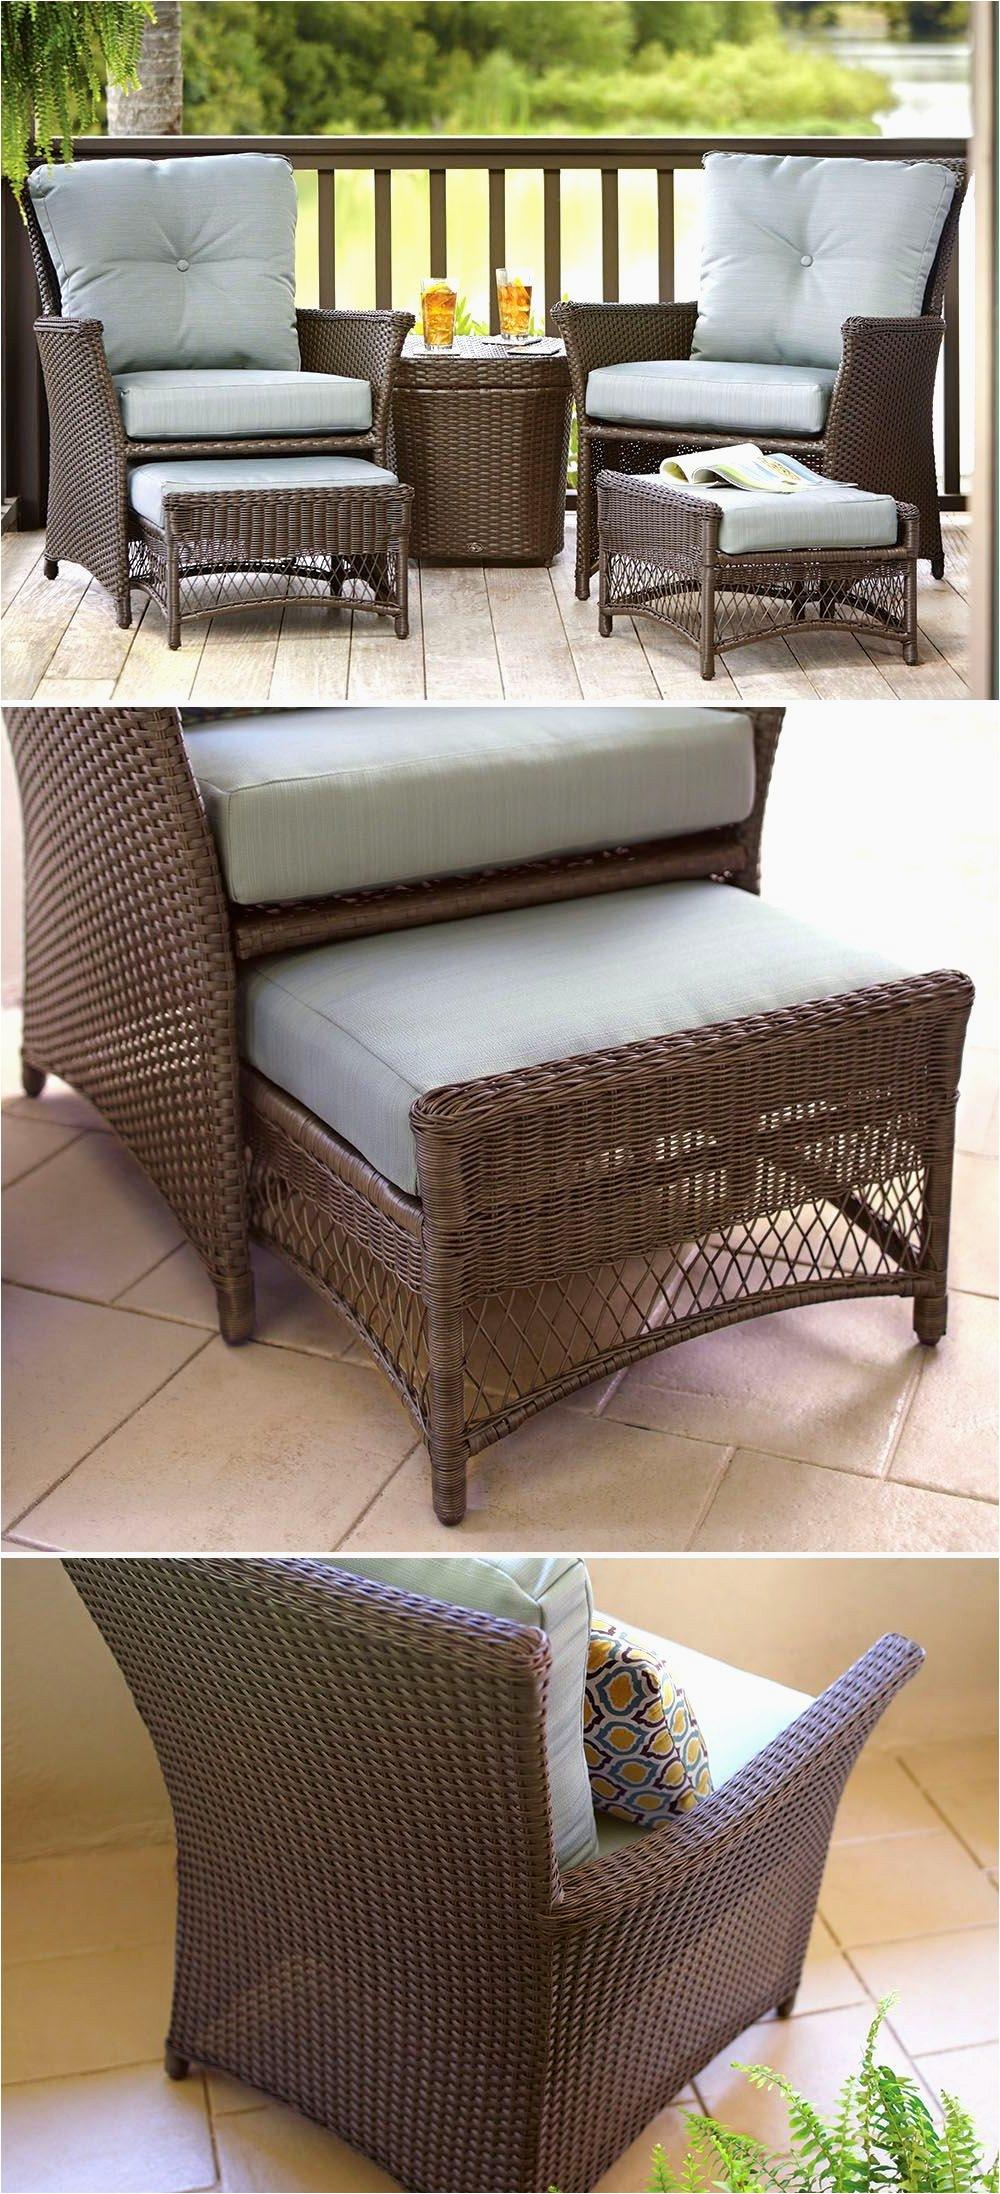 discount furniture des moines awesome 25 beautiful outdoor furniture des moines pics of discount furniture des